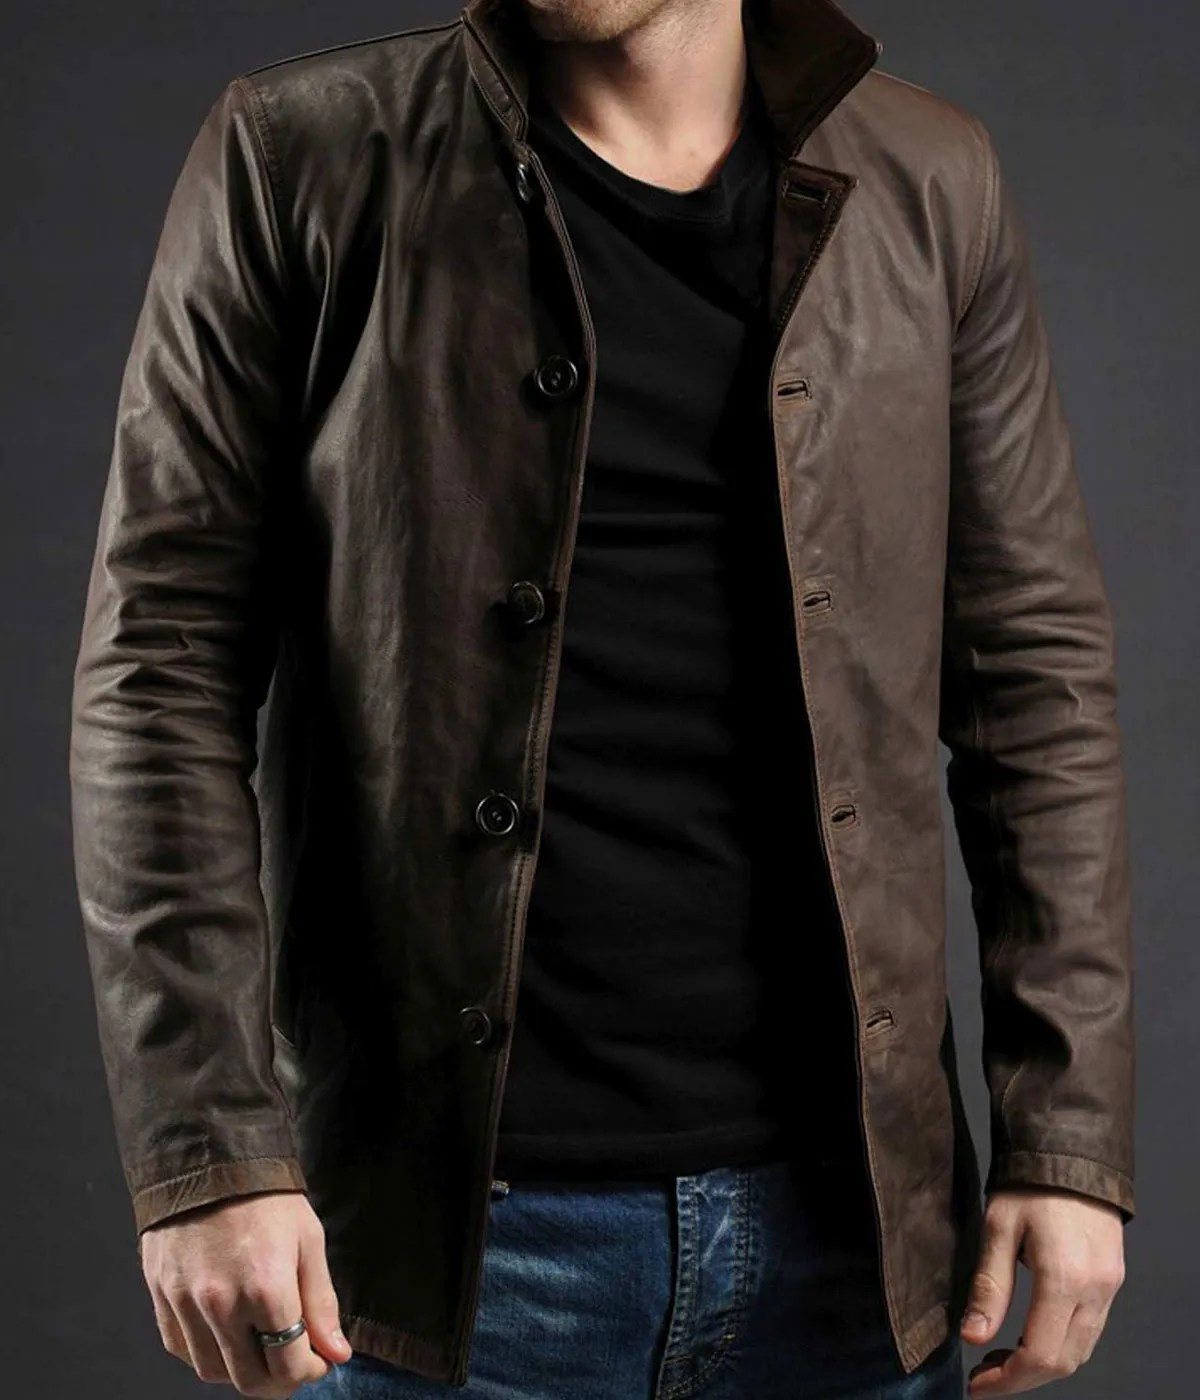 supernatural-dean-winchester-leather-coat